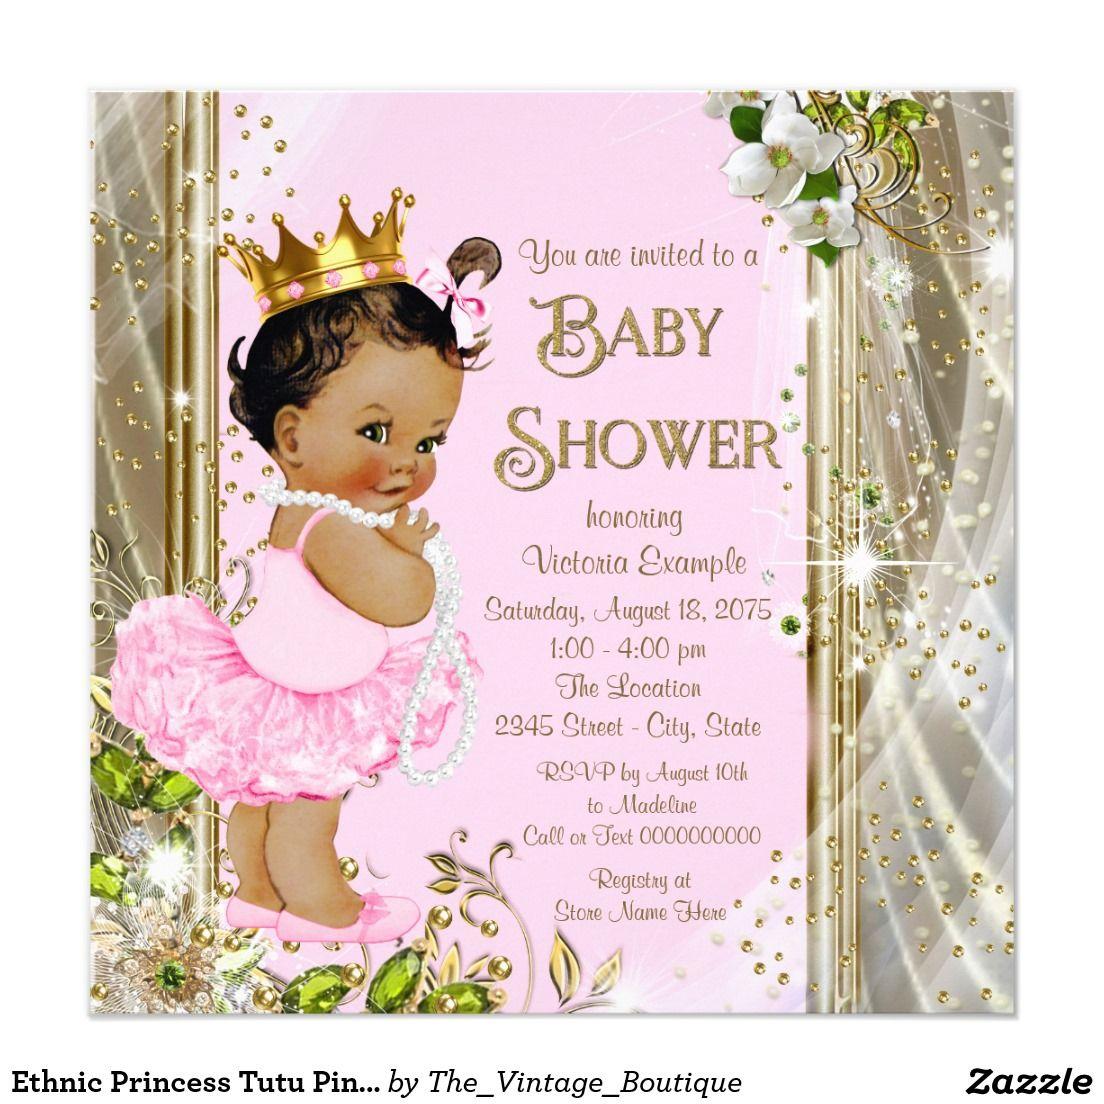 Ethnic Princess Tutu Pink Gold Baby Shower Invitation | Gold baby ...